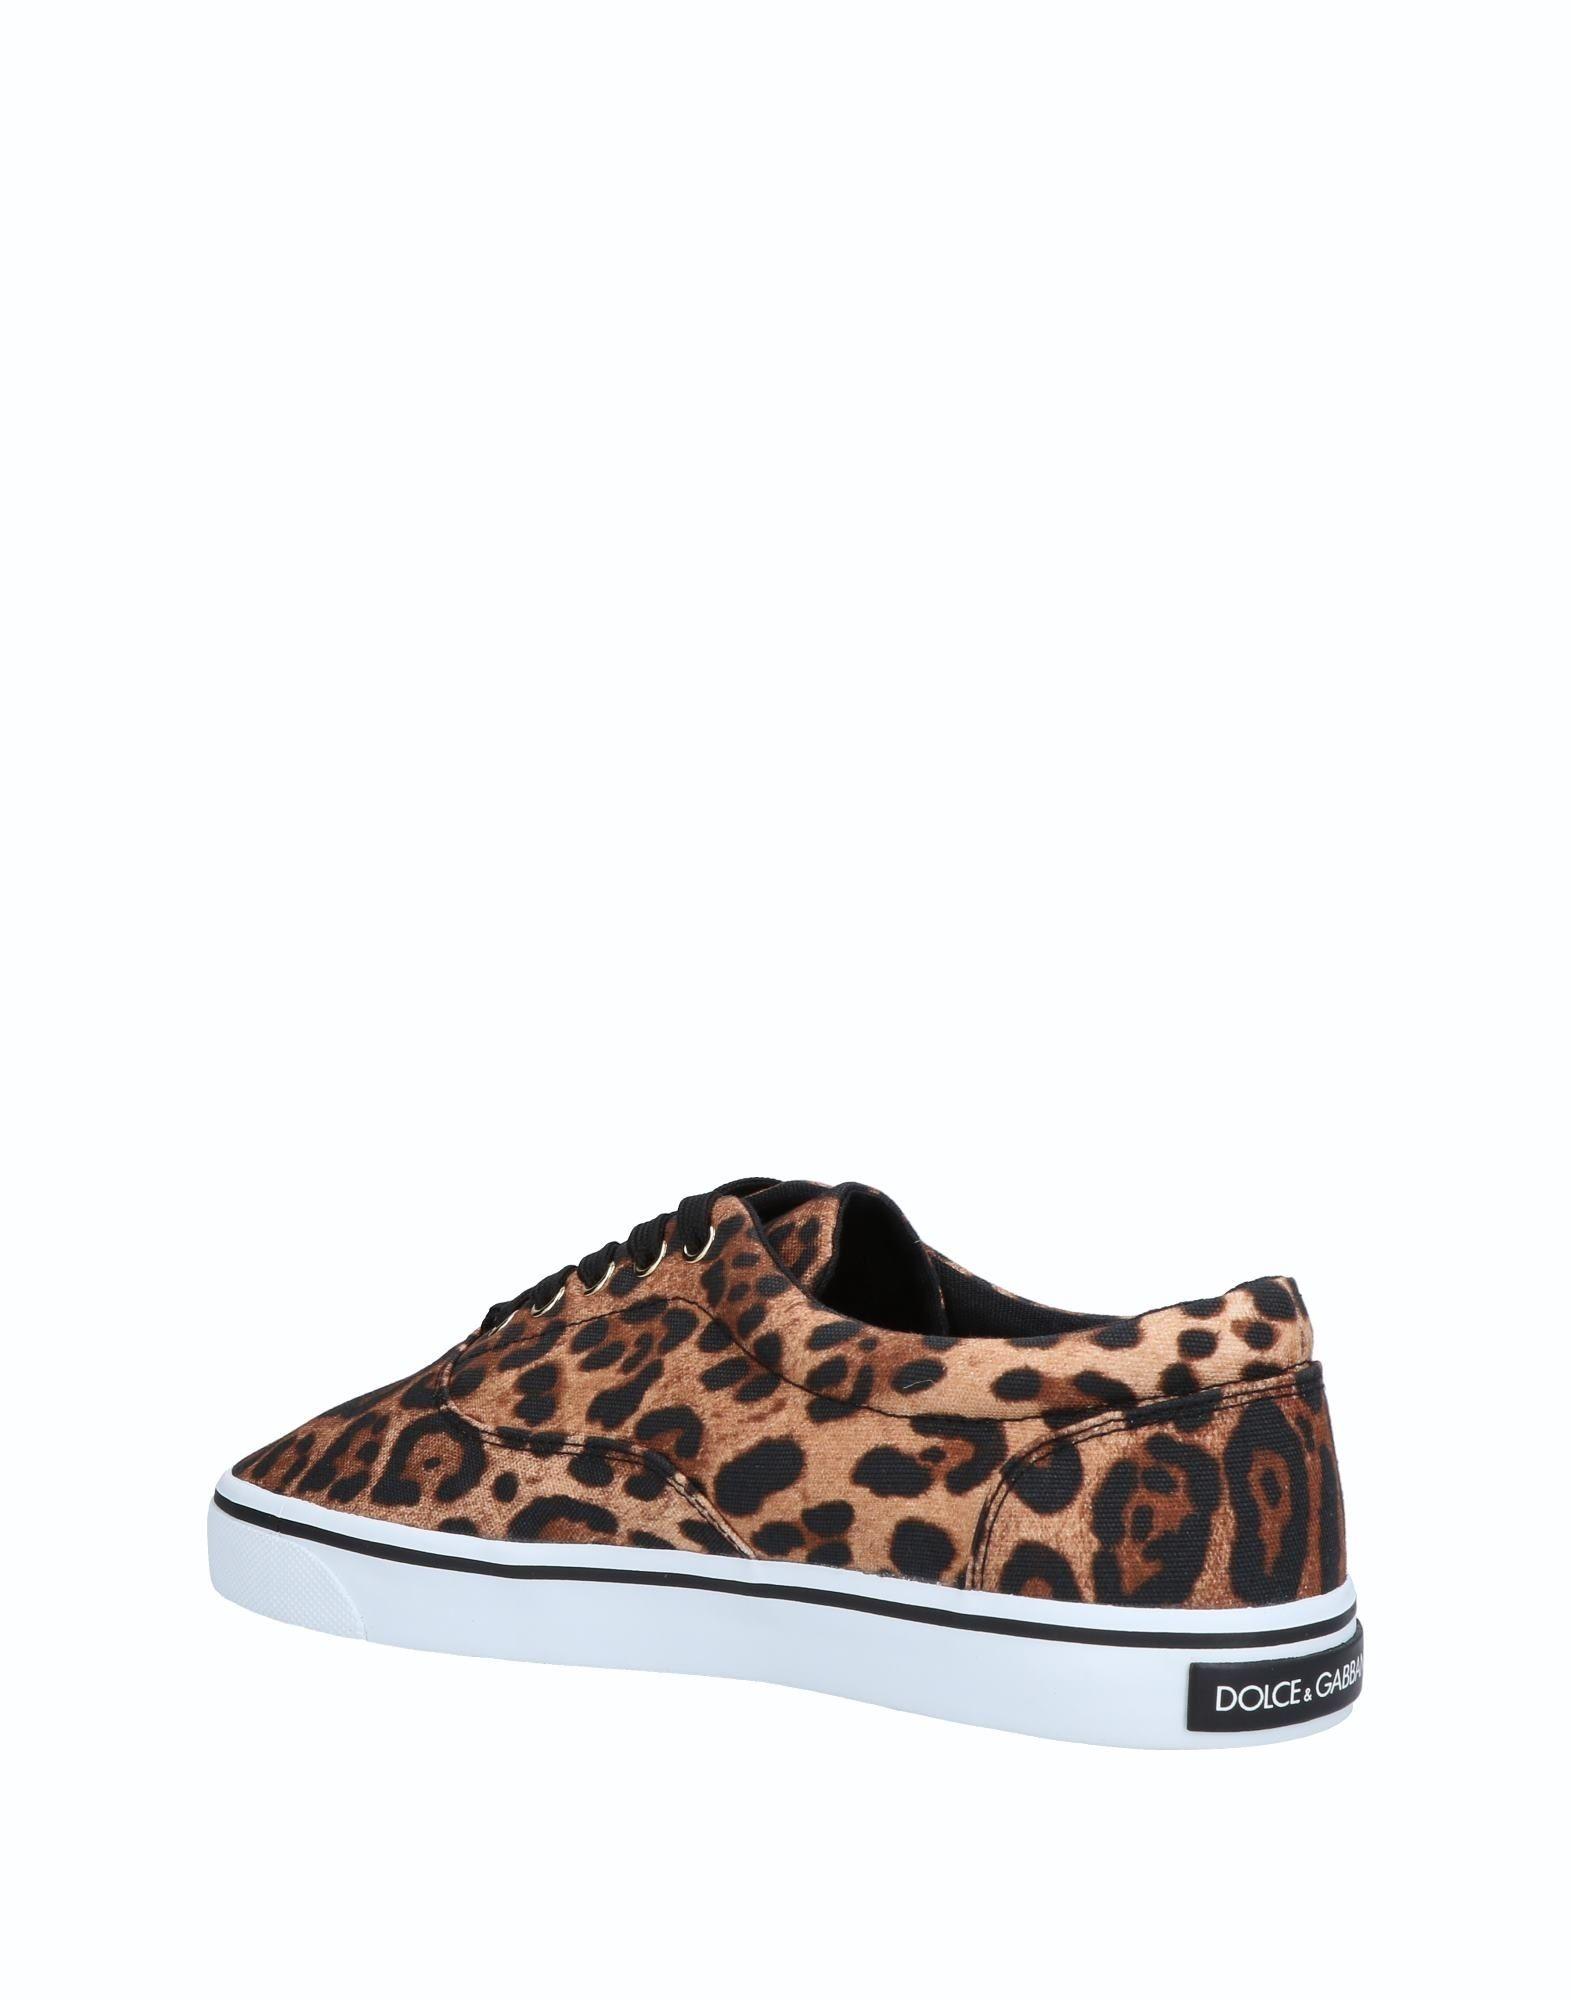 Dolce  & Gabbana Sneakers Herren  Dolce 11465953OI Gute Qualität beliebte Schuhe beec68